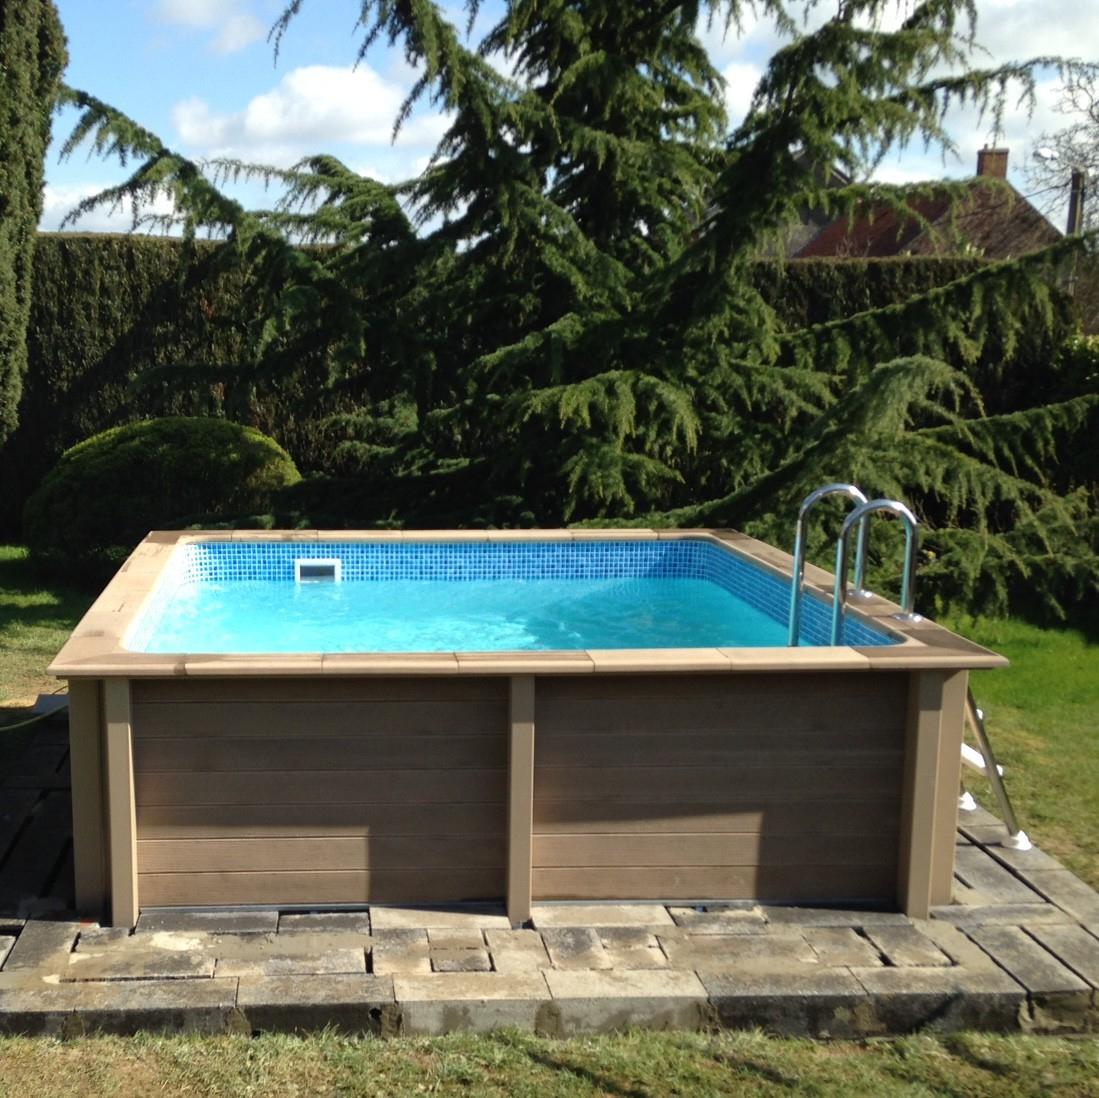 Https://.ma-Piscine-Beton/piscine-Decagonale/2406 ... serapportantà Piscine Naturalis